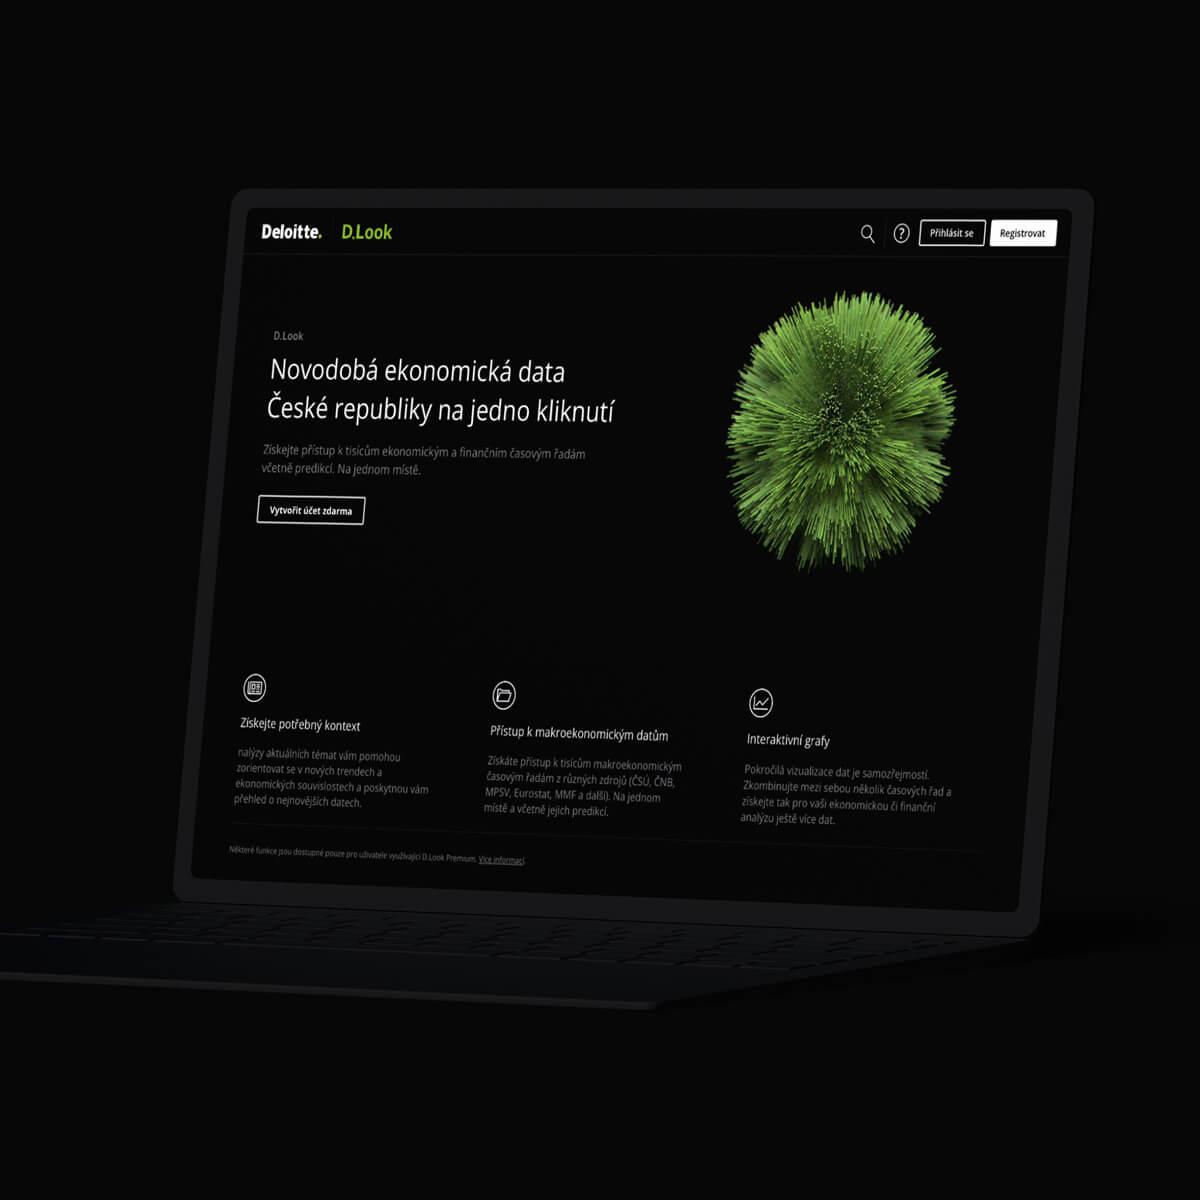 Ukázka webu na laptopu